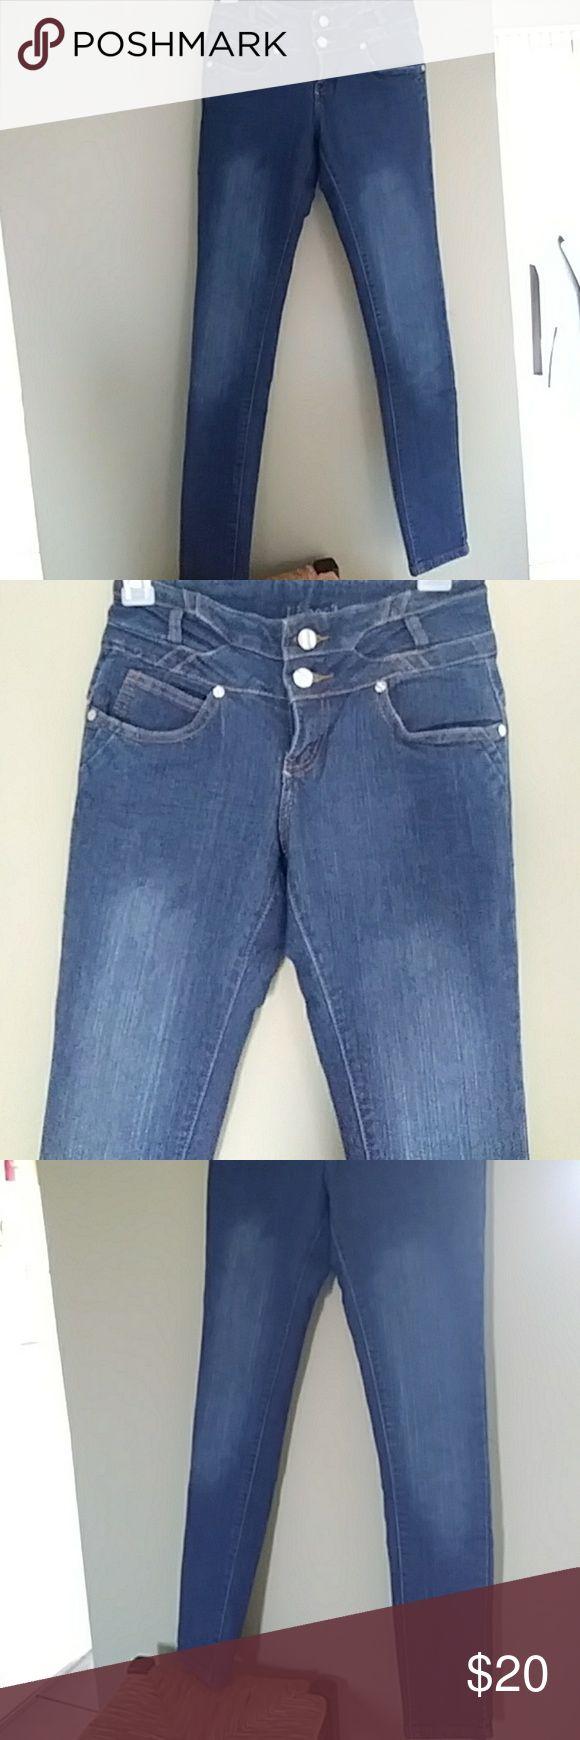 La Bonita skinny jeans Wore x2..dark blue skinny jeans makes ur rear end look big. La Bonita Jeans Skinny